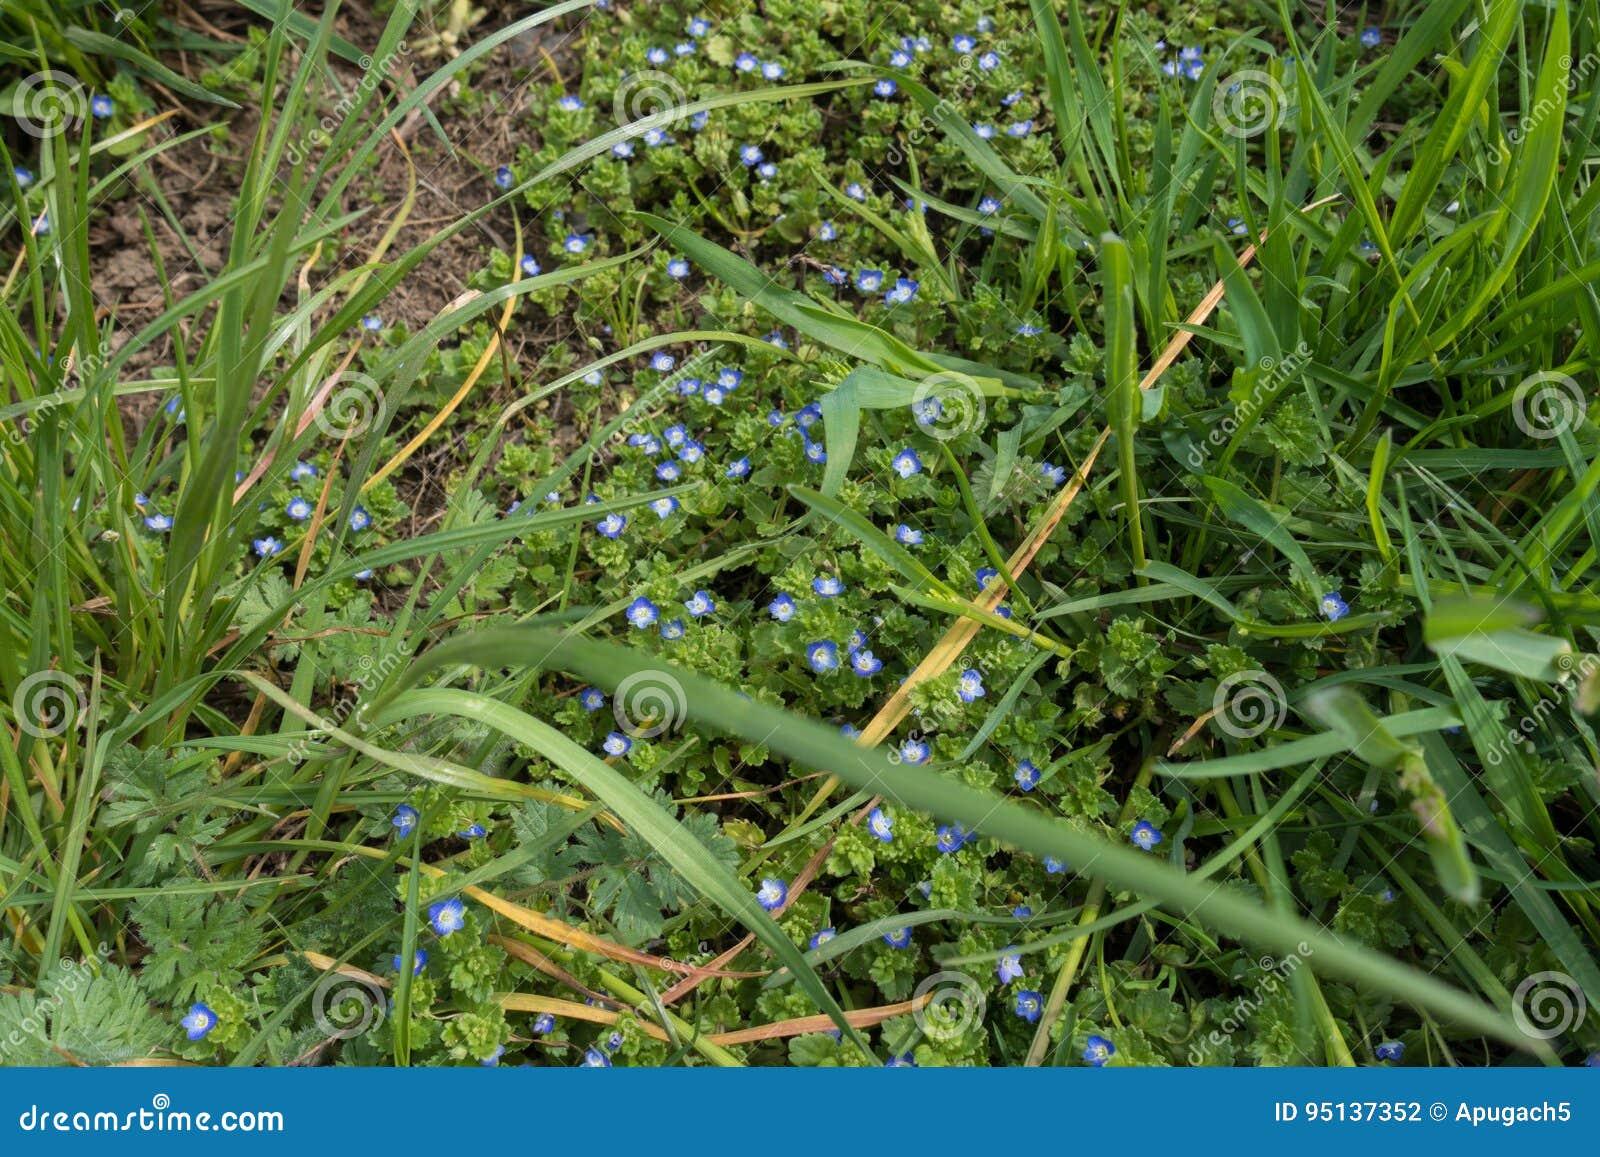 Veronica in voller Blüte im hohen Gras